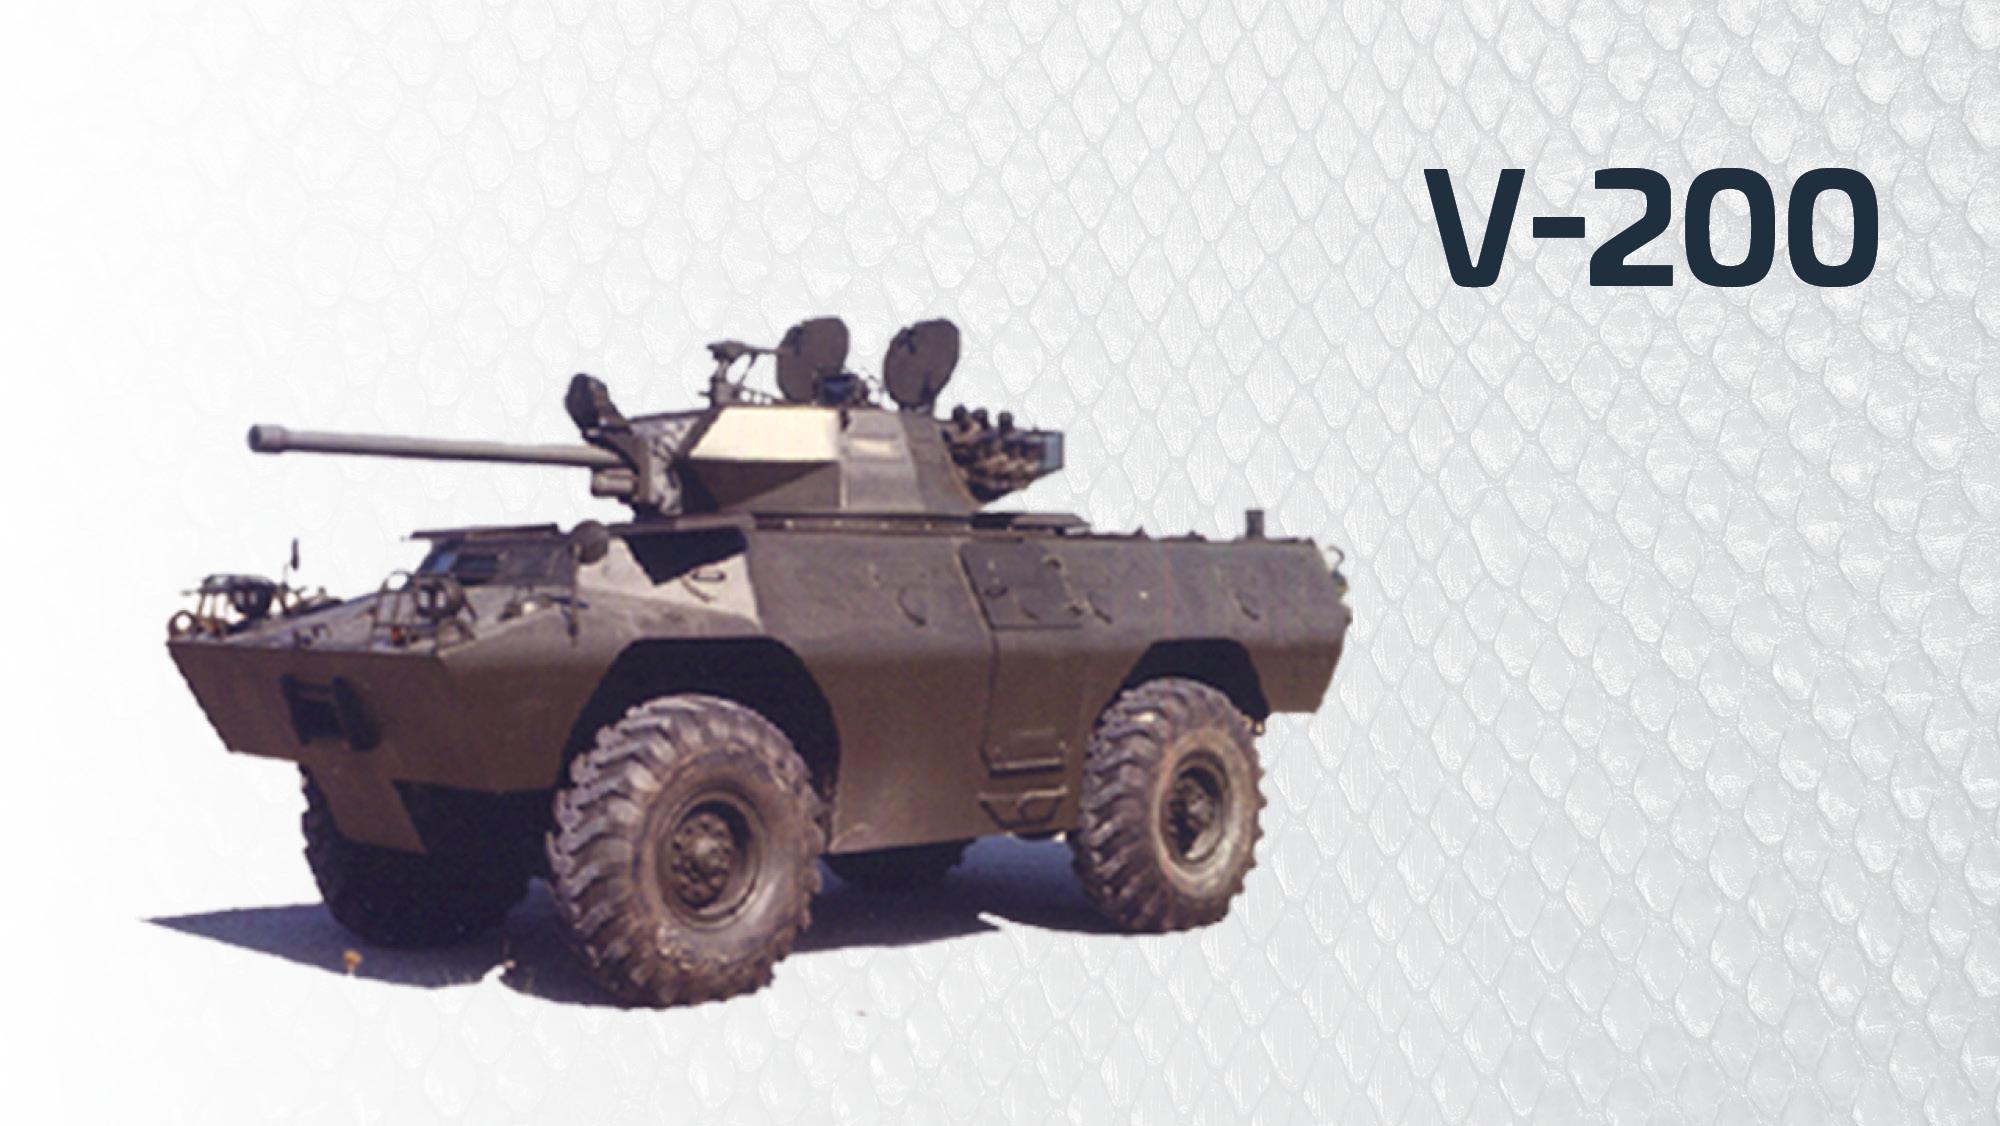 Textron Systems V-200